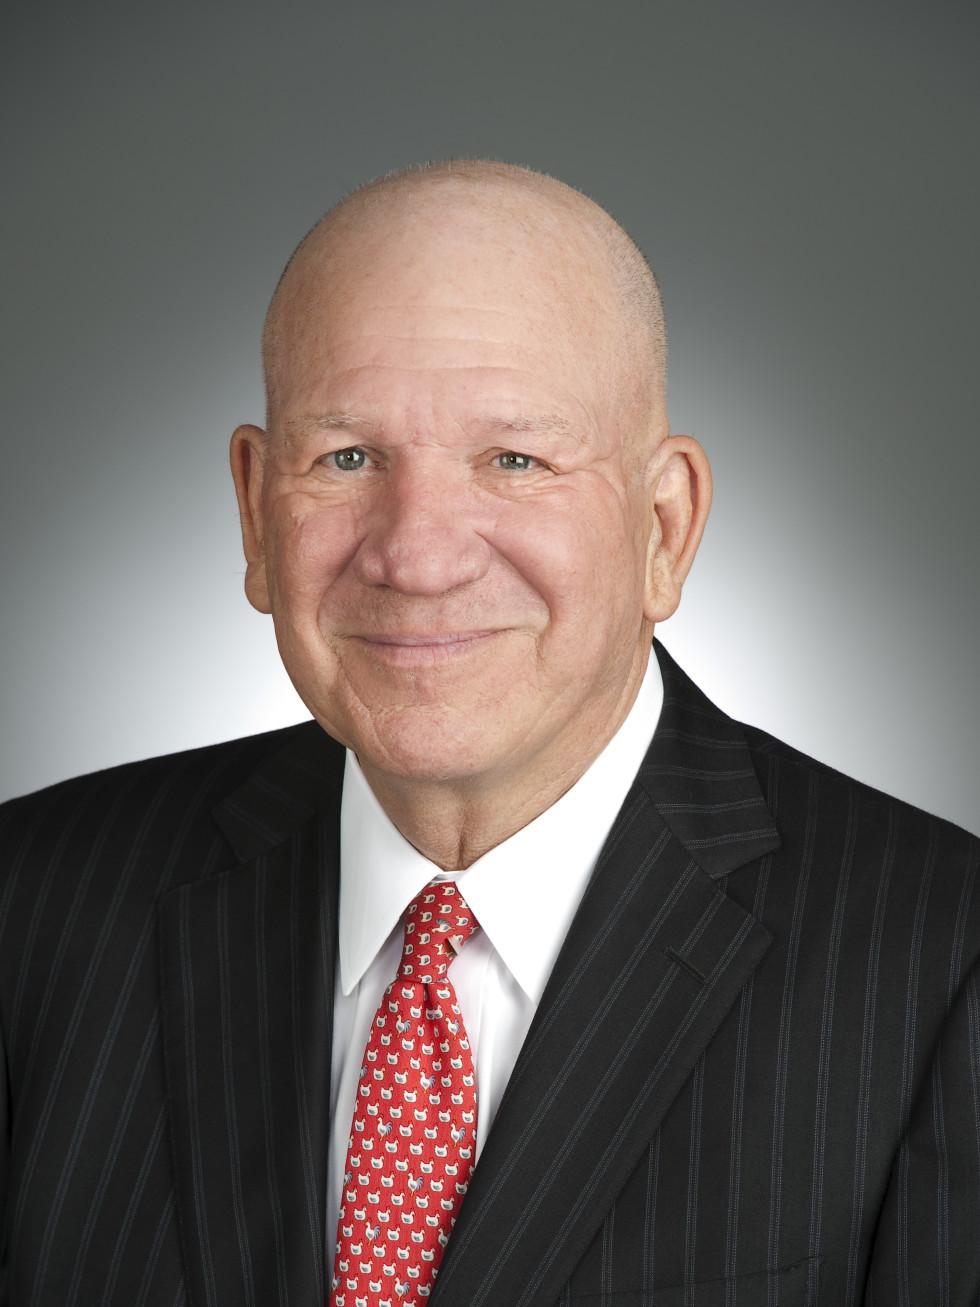 A.J. Jim Teague